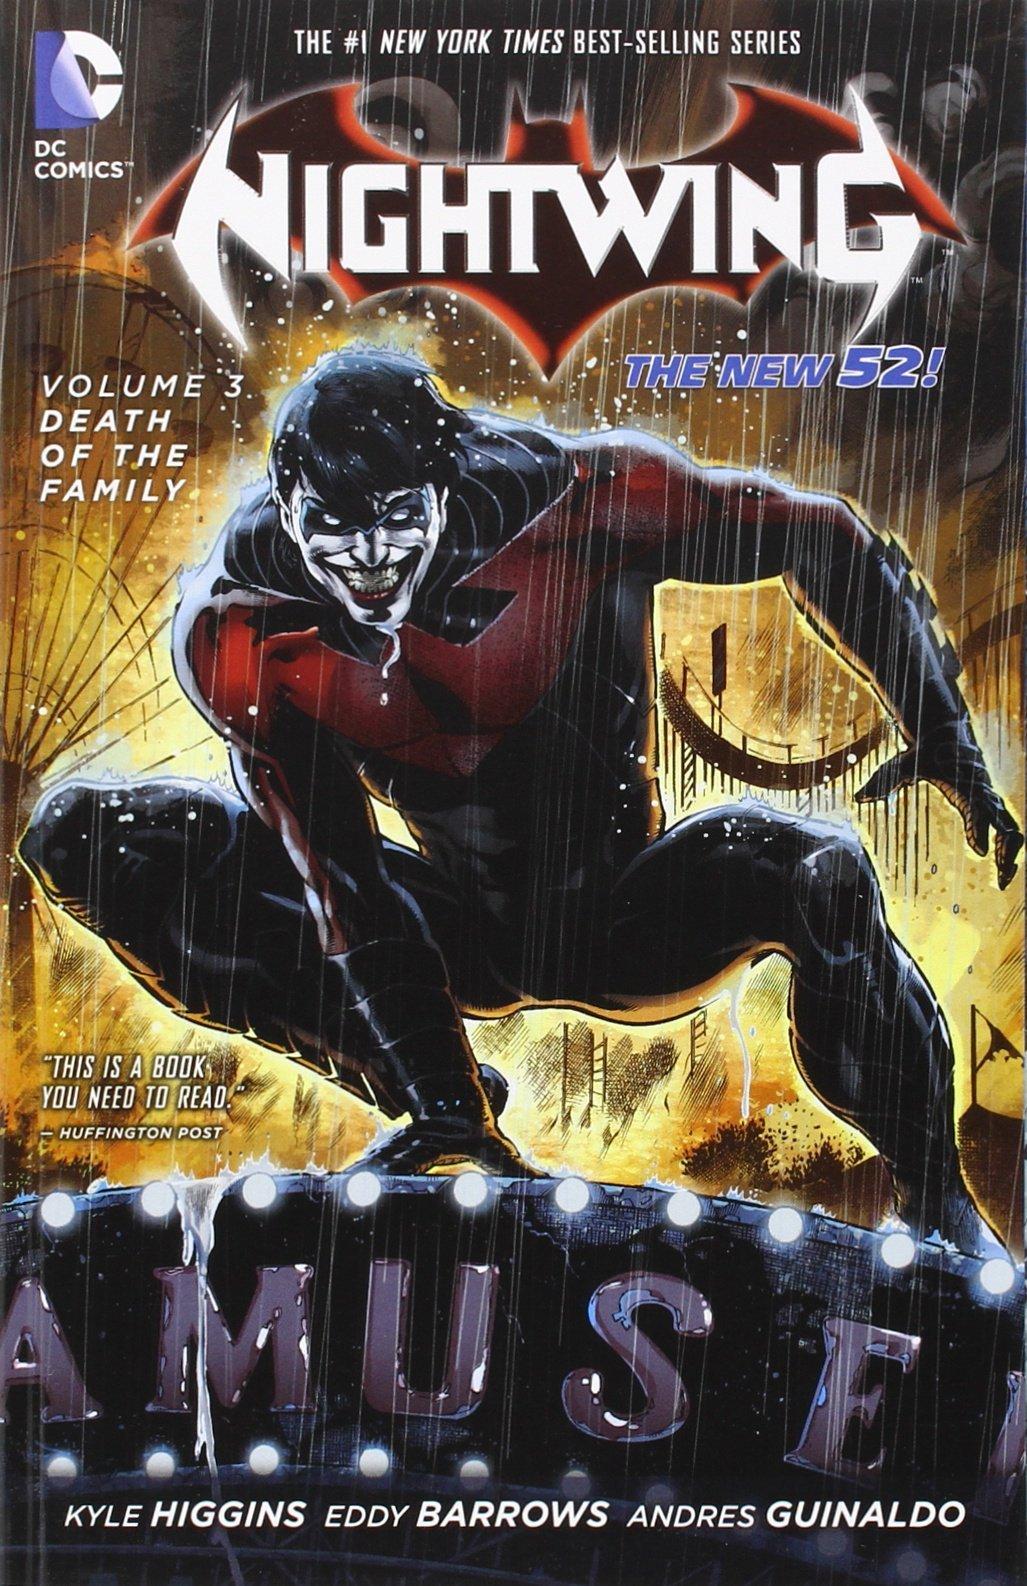 Nightwing Vol. 3 by Kyle Higgins image